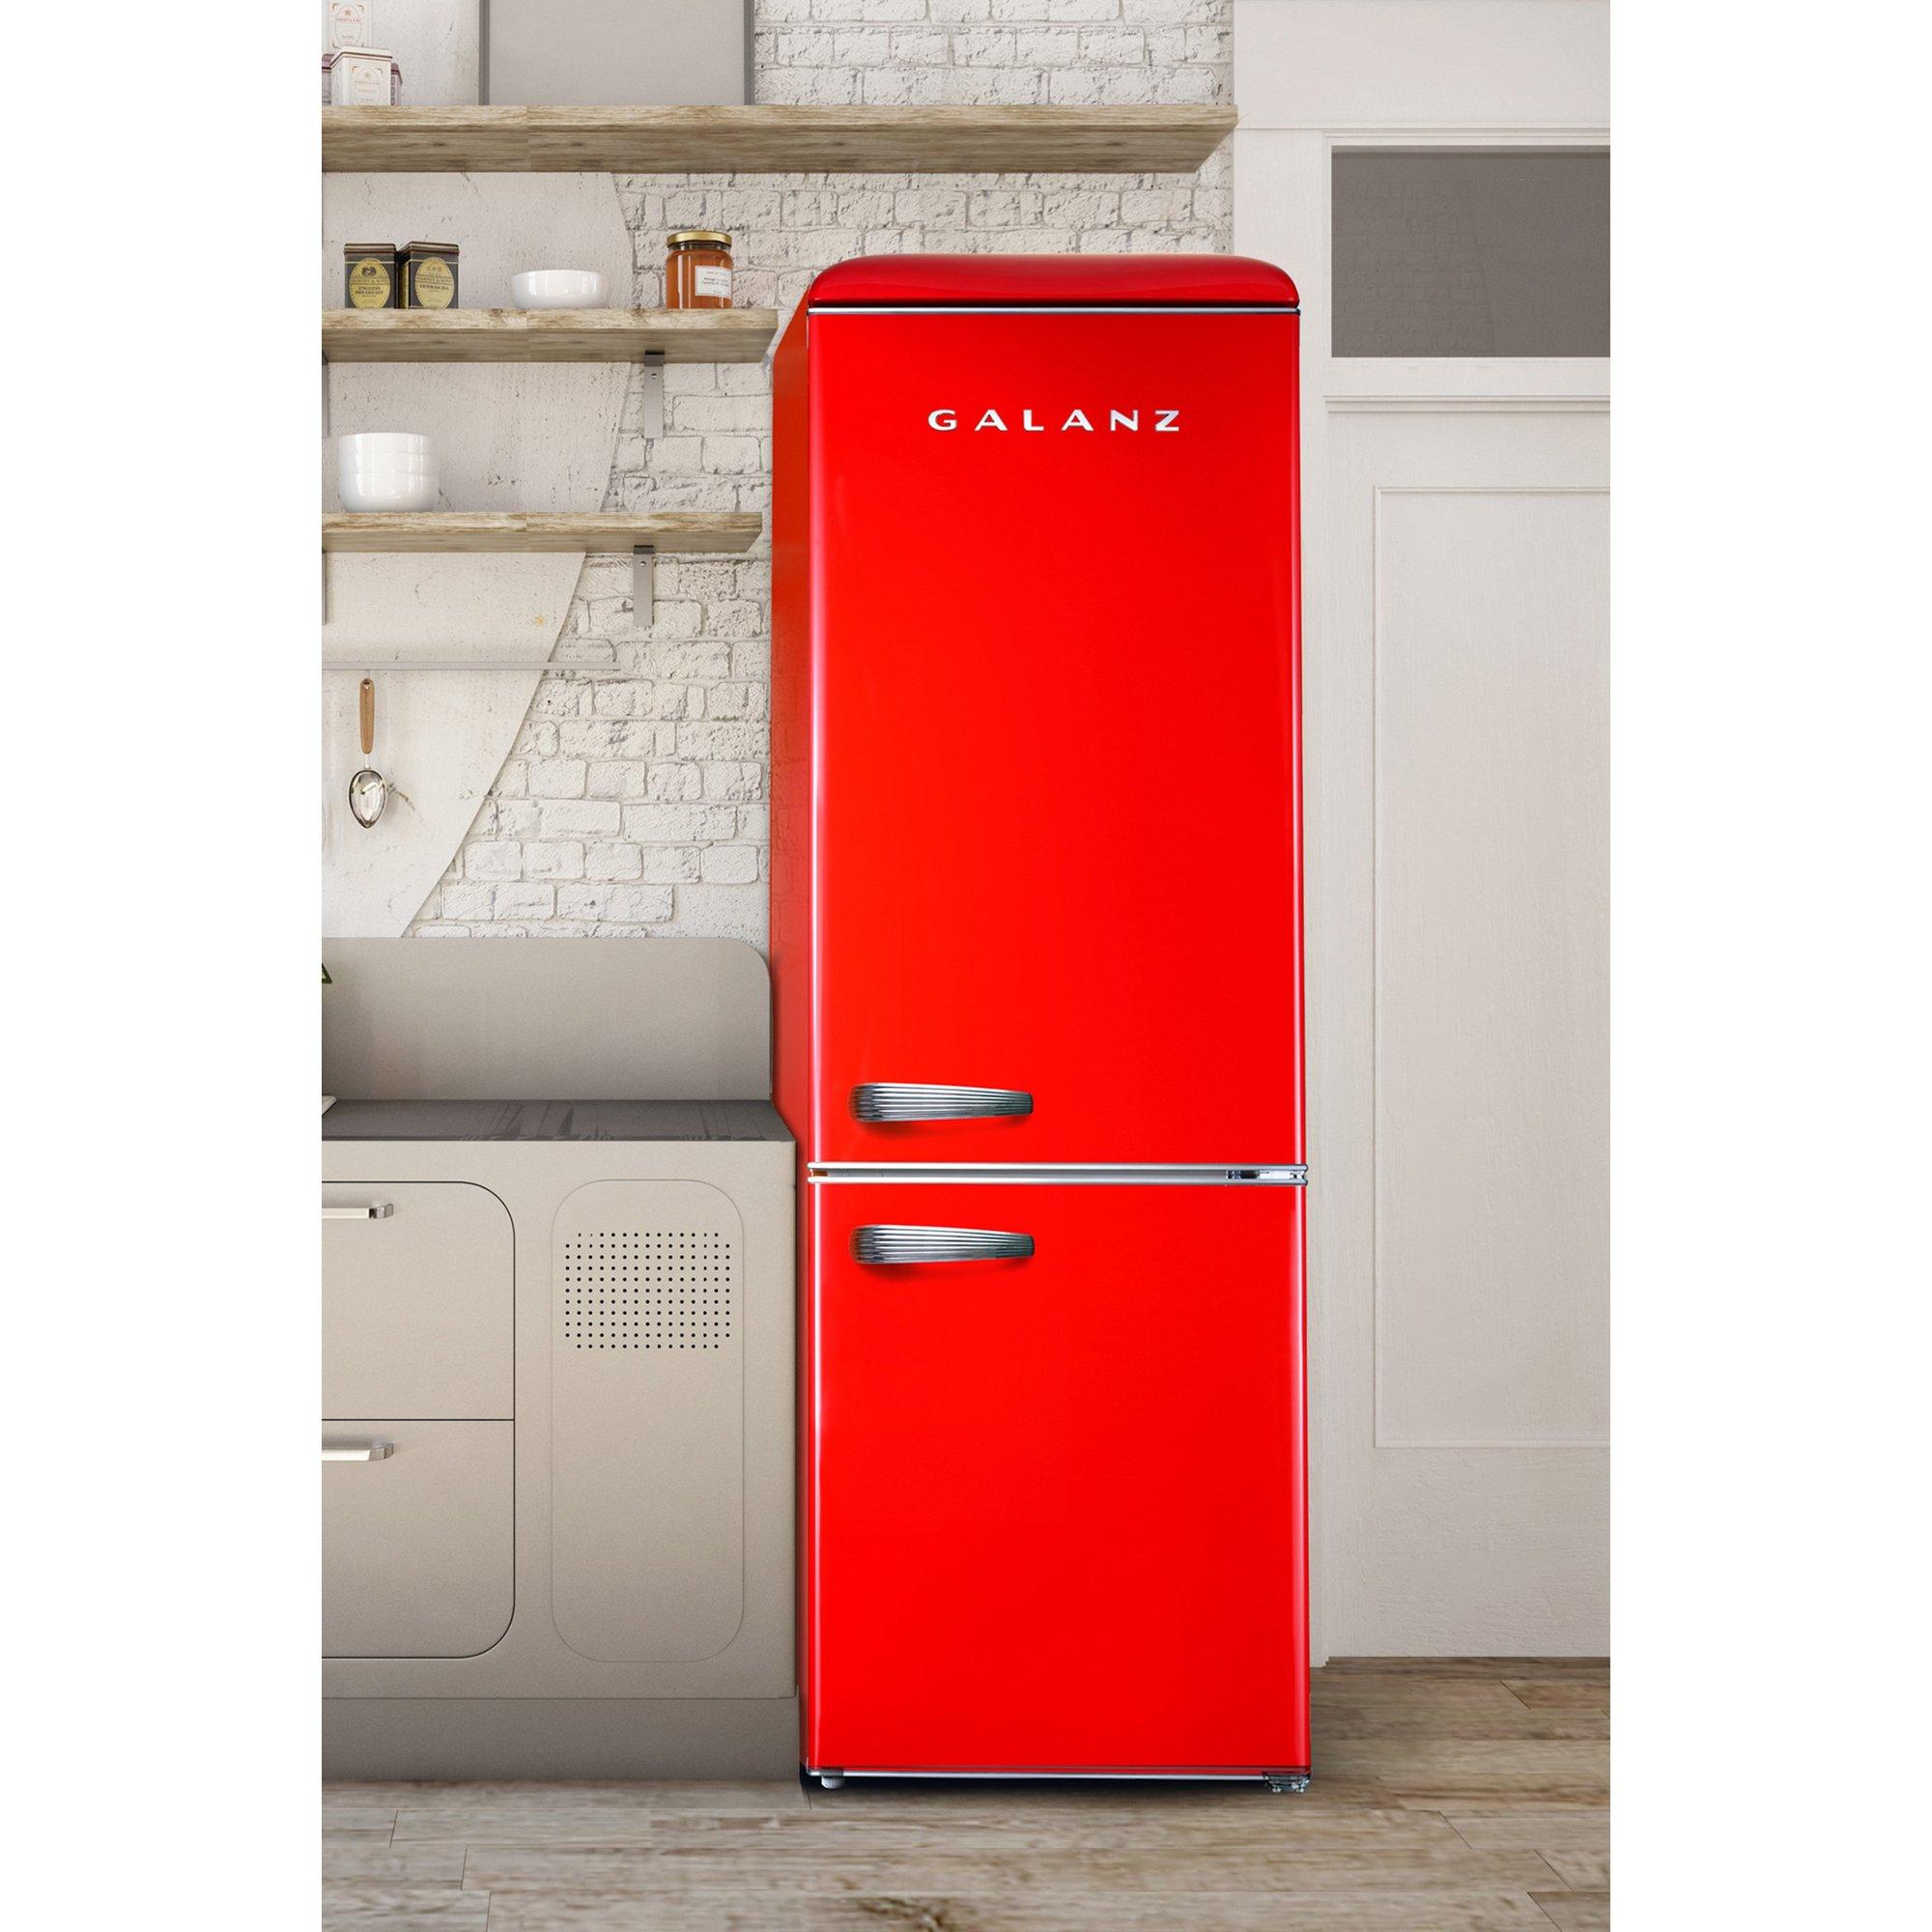 Image of Galanz 60cm 300L Retro Fridge Freezer